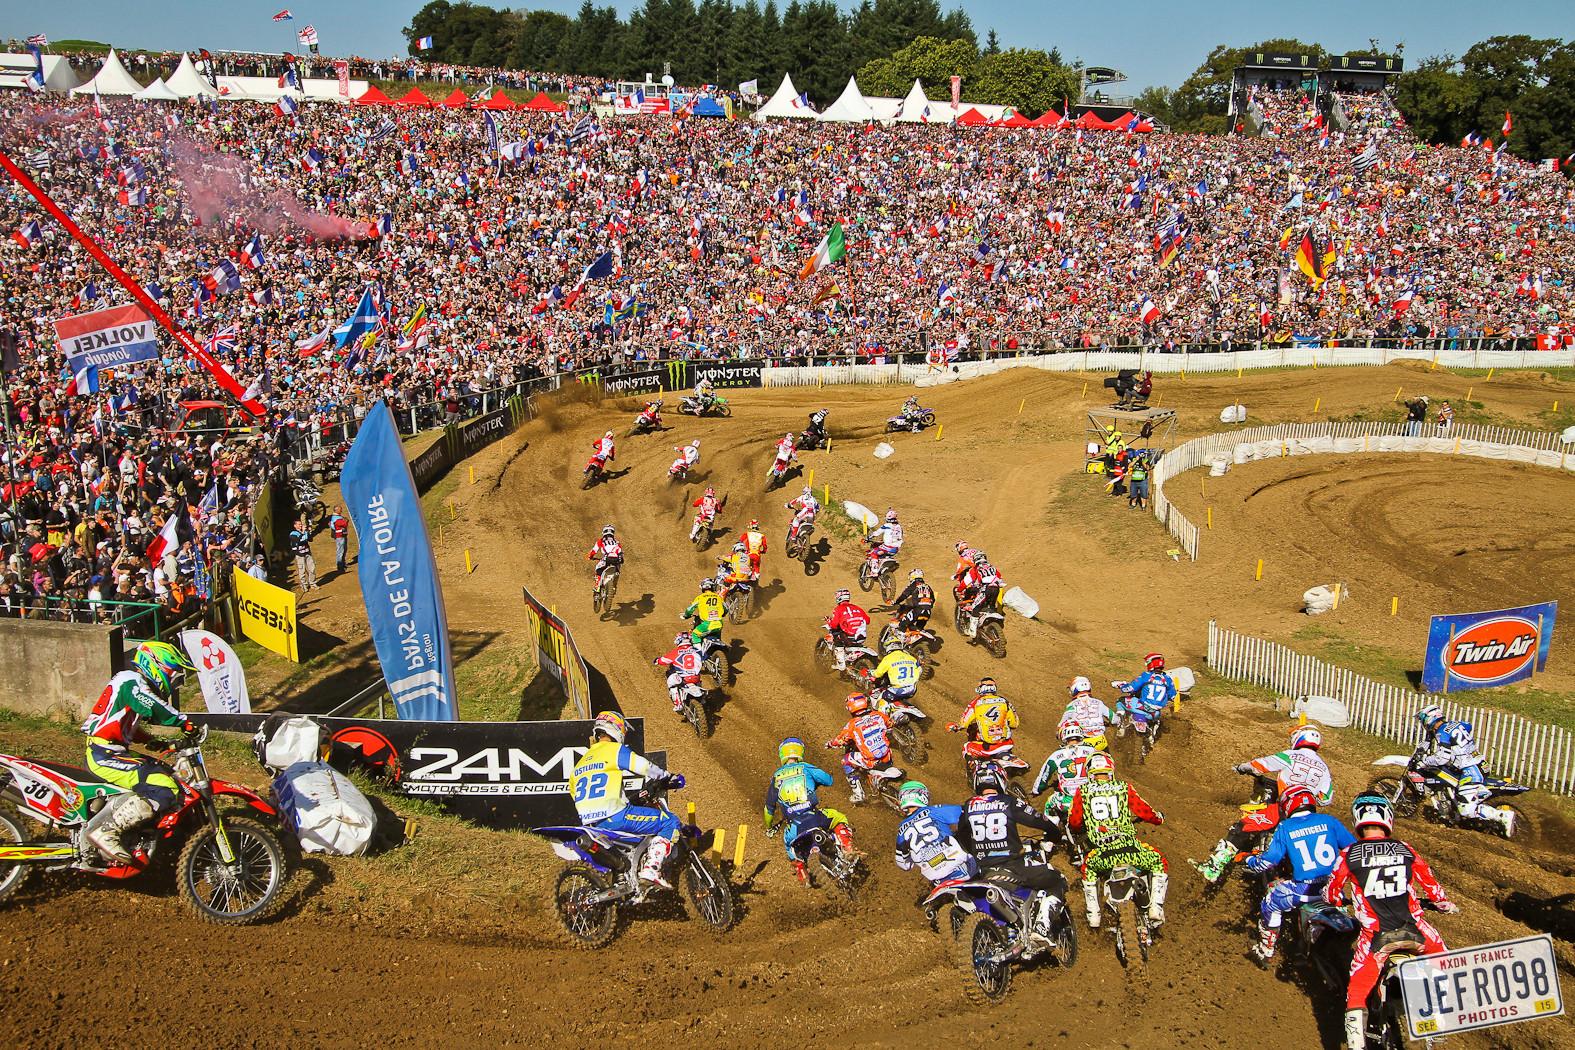 MX2 / Open - Photo Blast: MXoN Sunday racing - Motocross Pictures - Vital MX